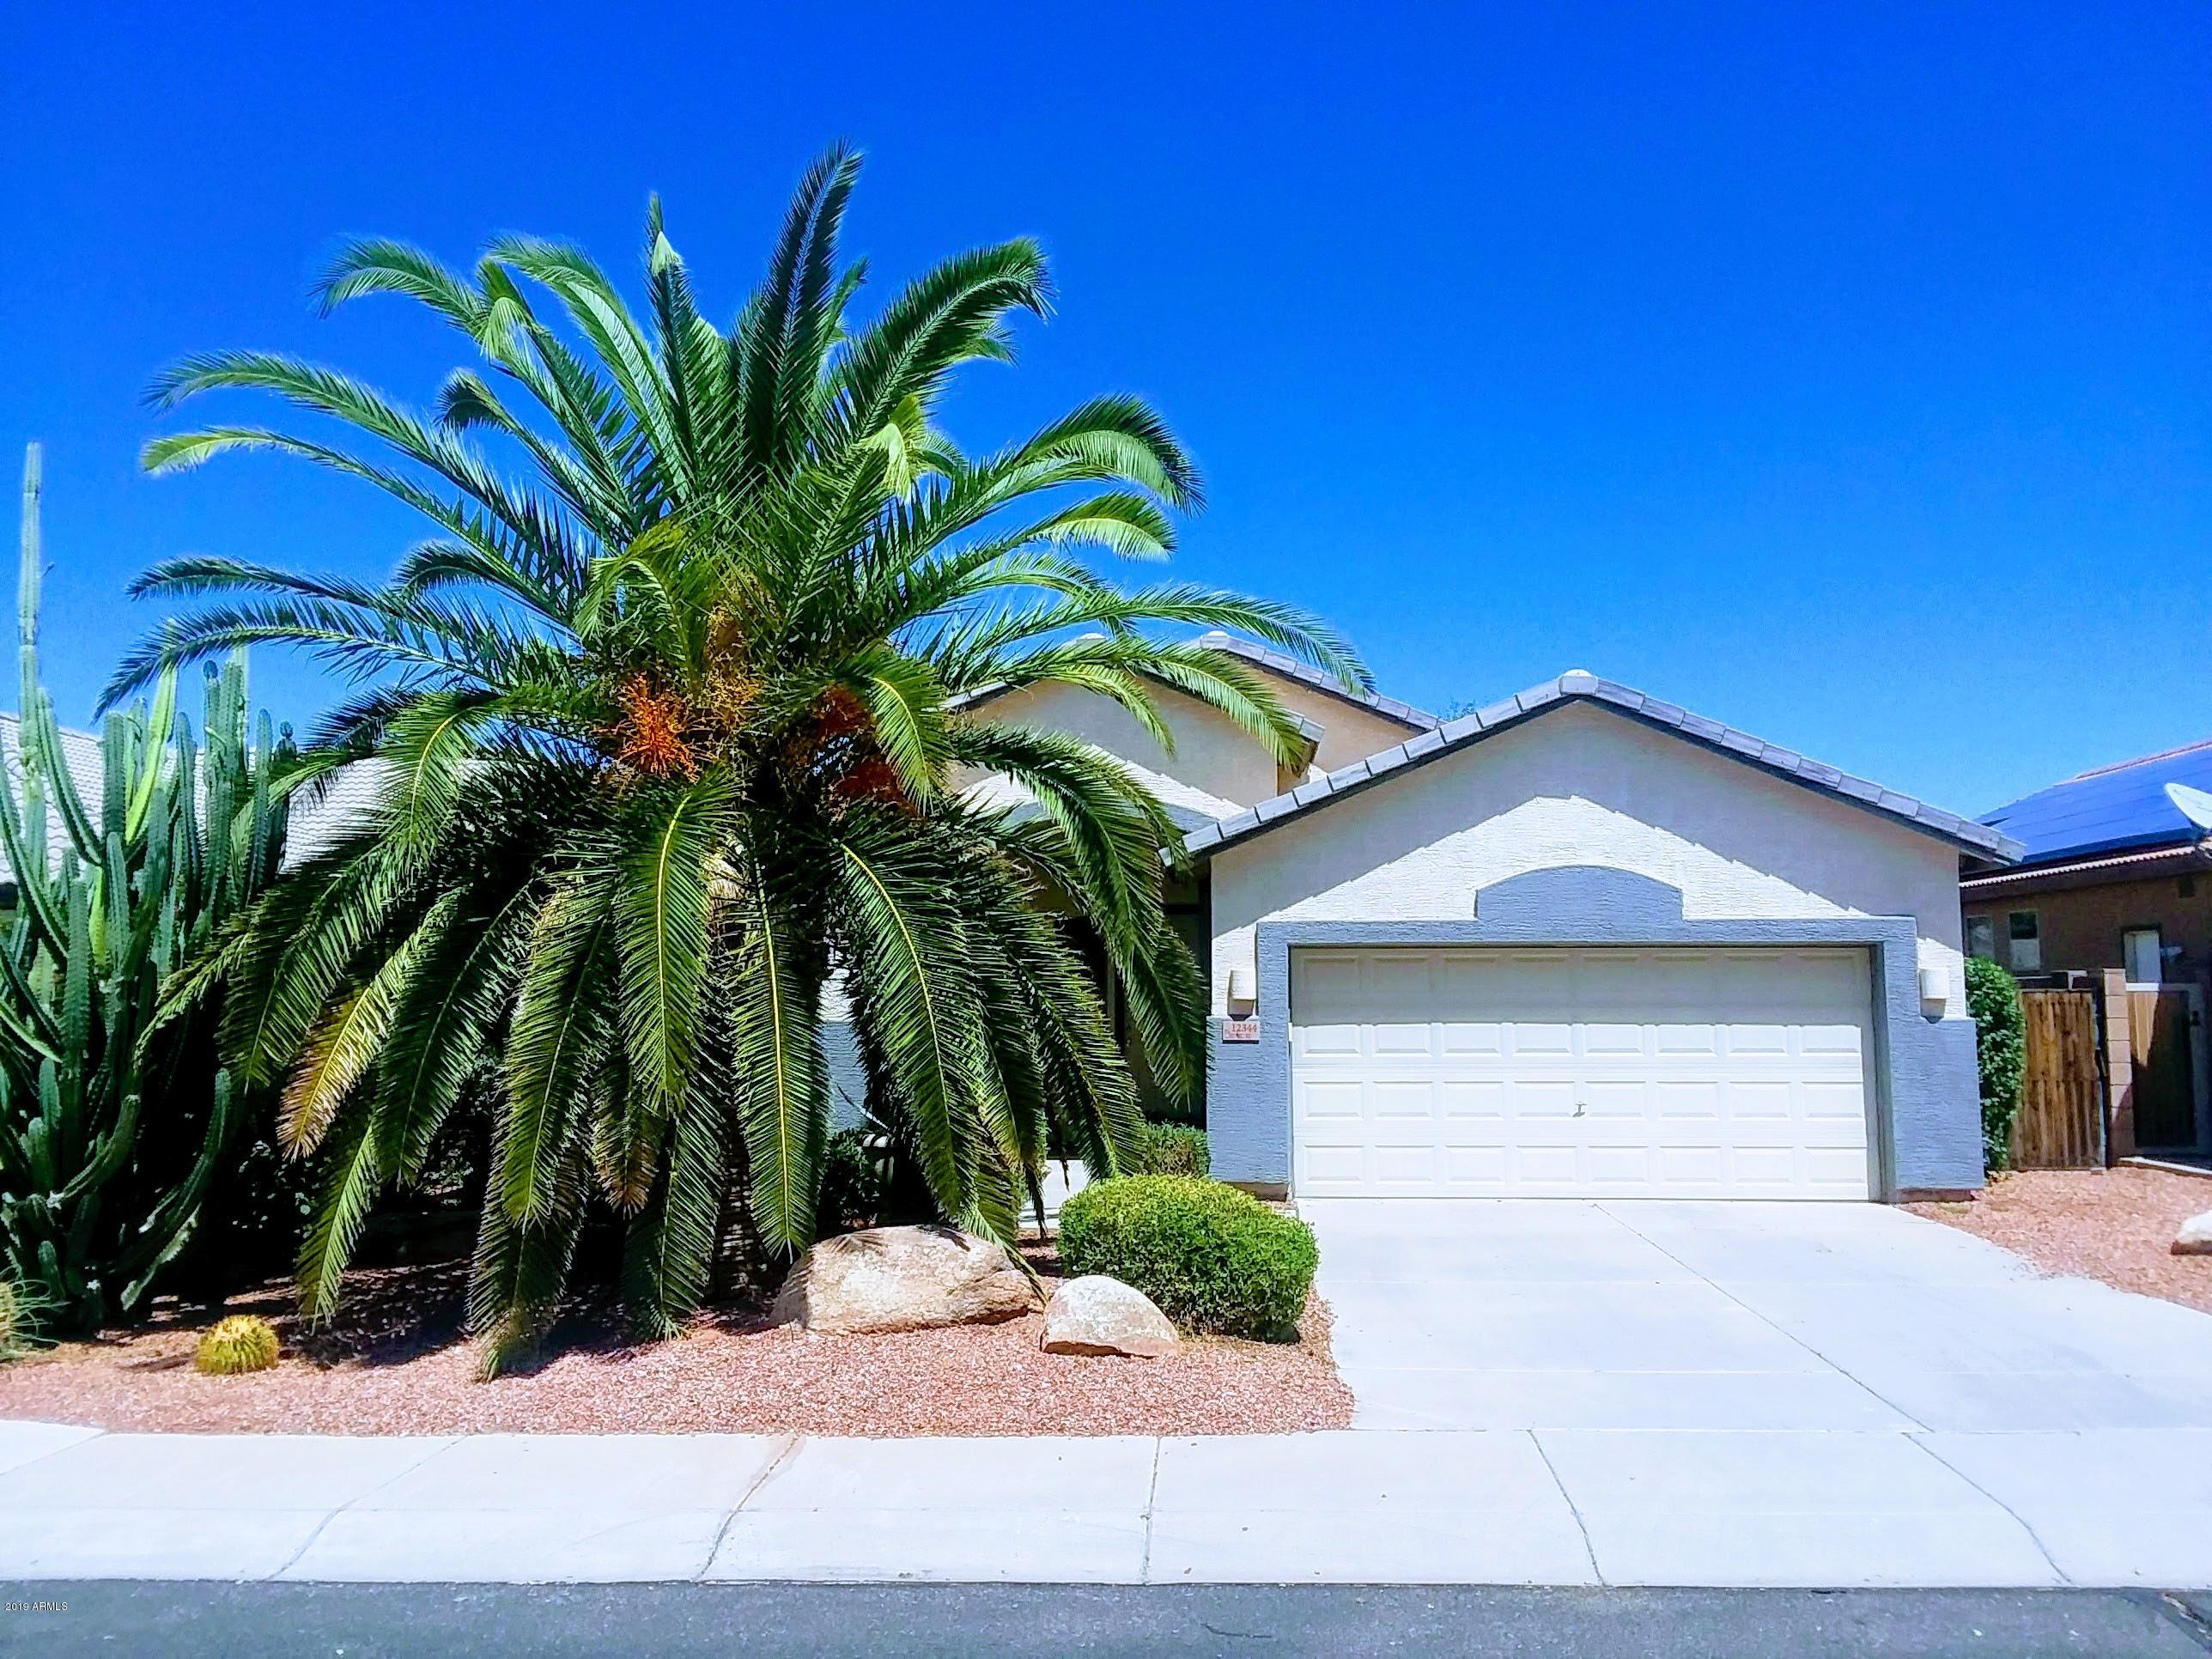 Photo of 12344 W MADISON Street, Avondale, AZ 85323